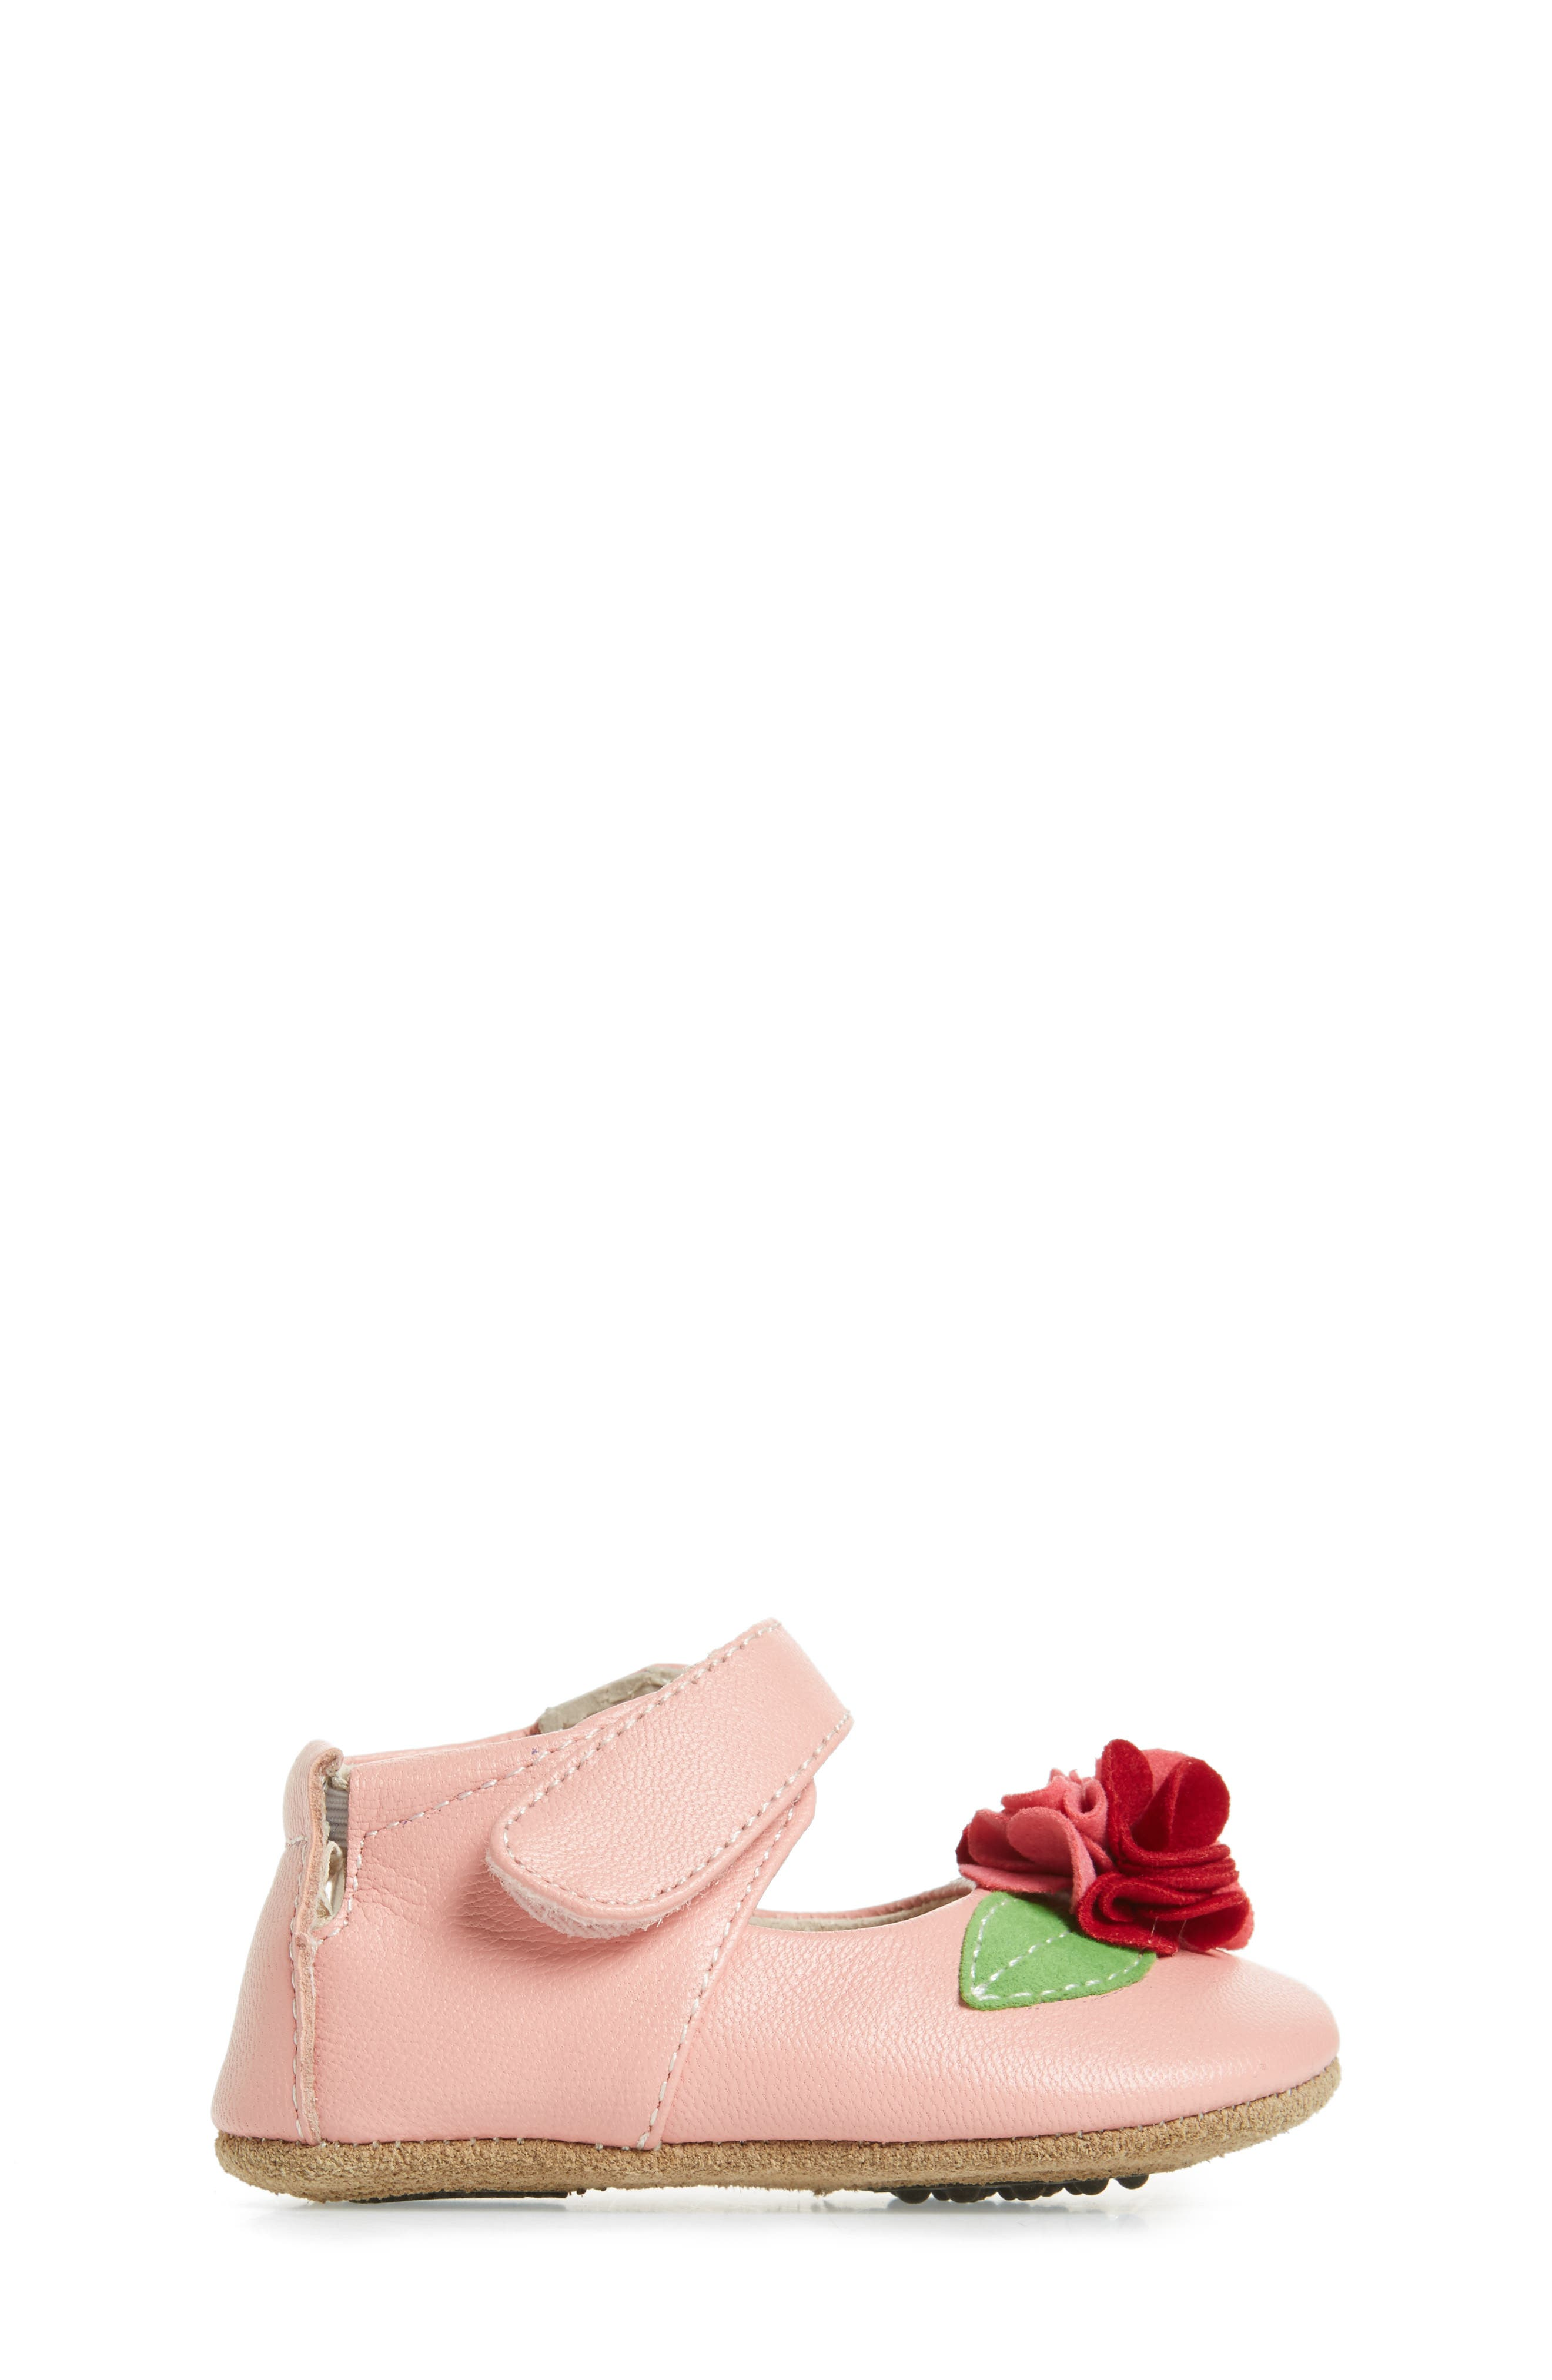 Rosa Mary Jane Crib Shoe,                             Alternate thumbnail 3, color,                             Light Pink